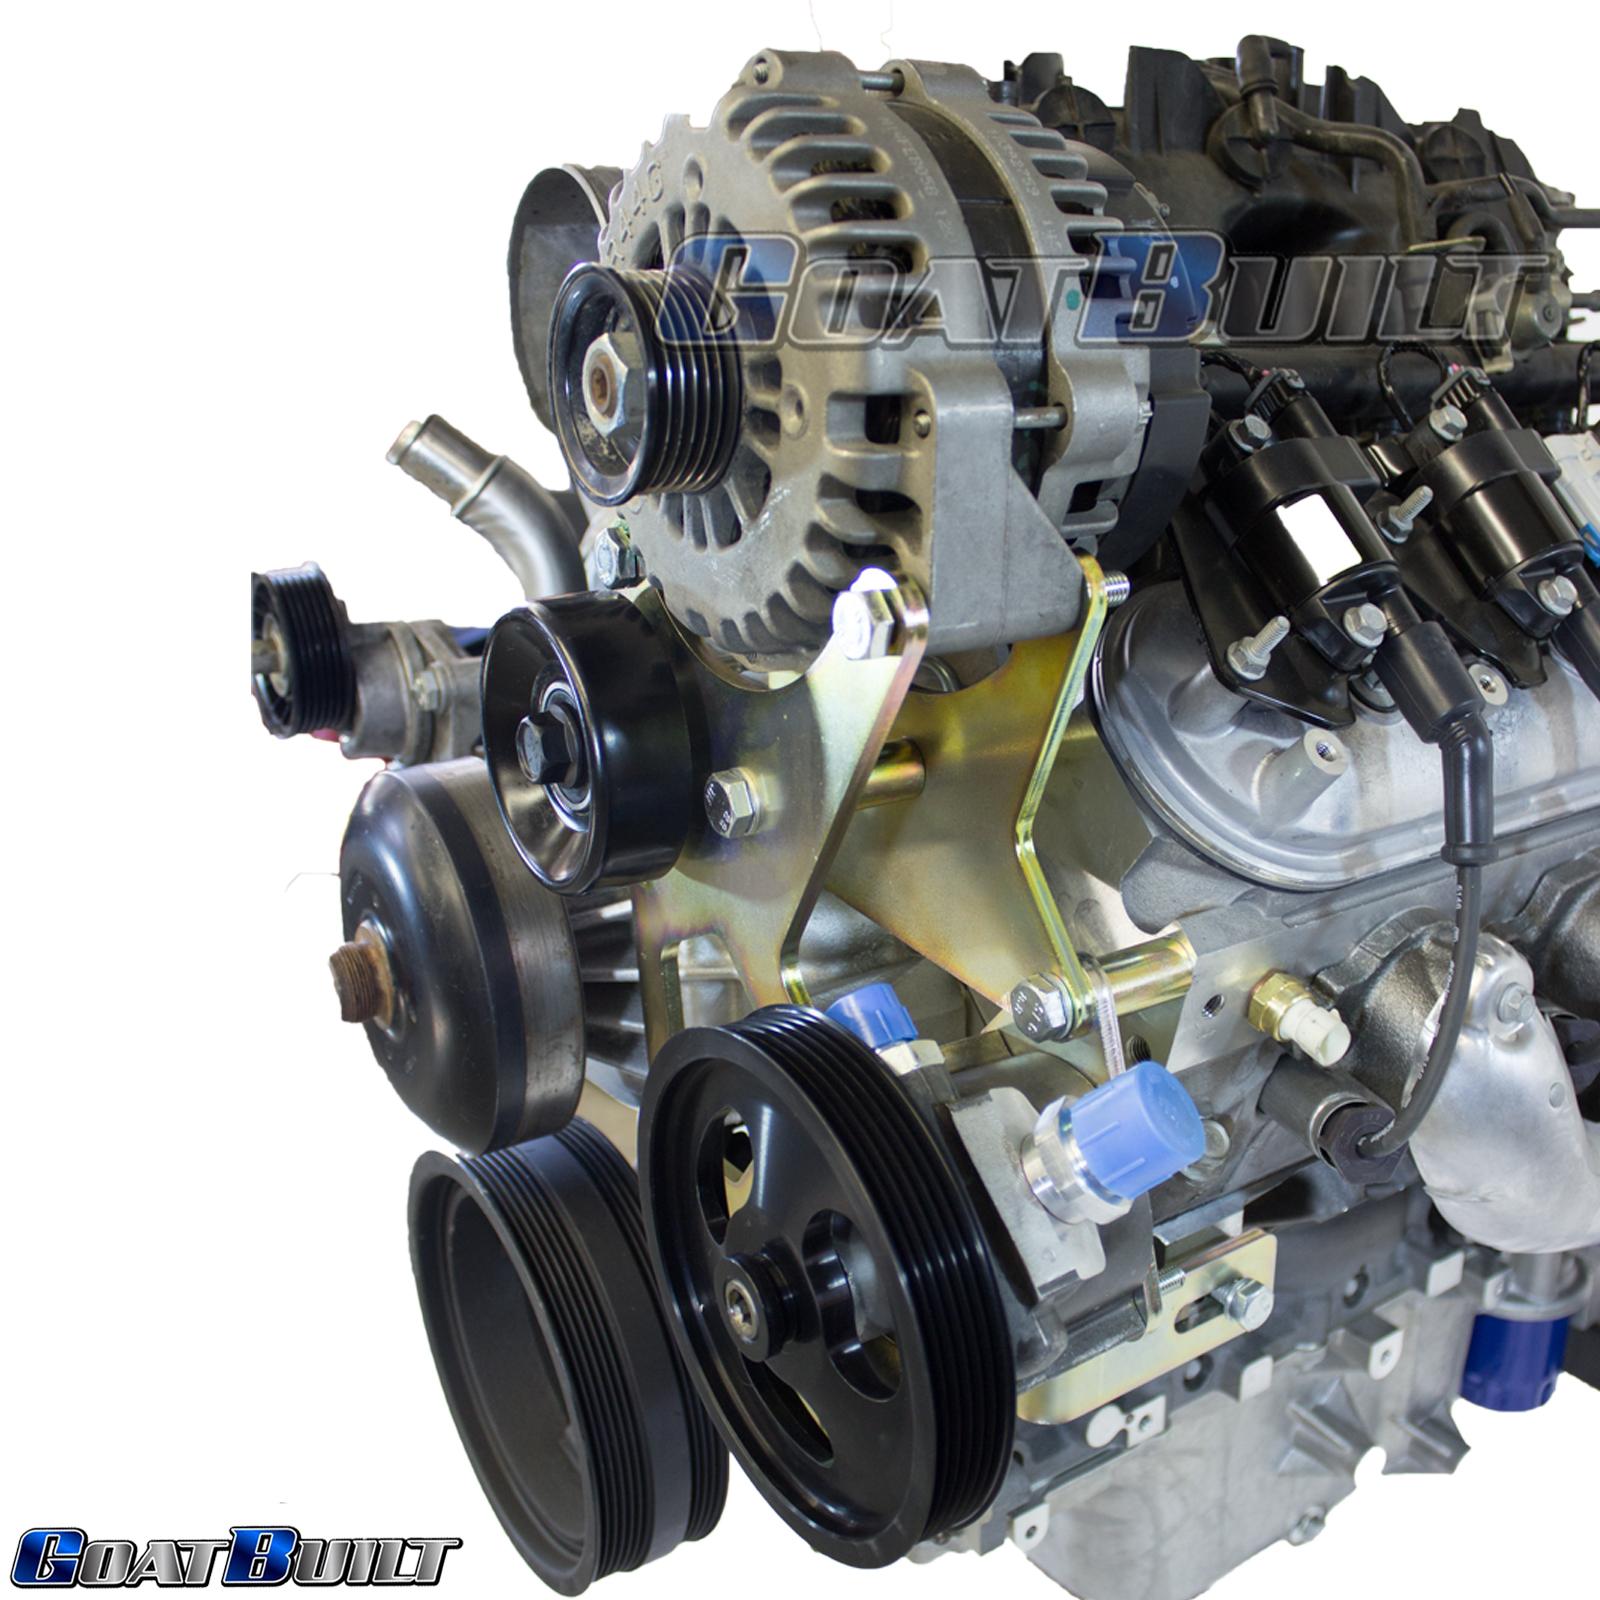 5.7l mercruiser engine service manual free